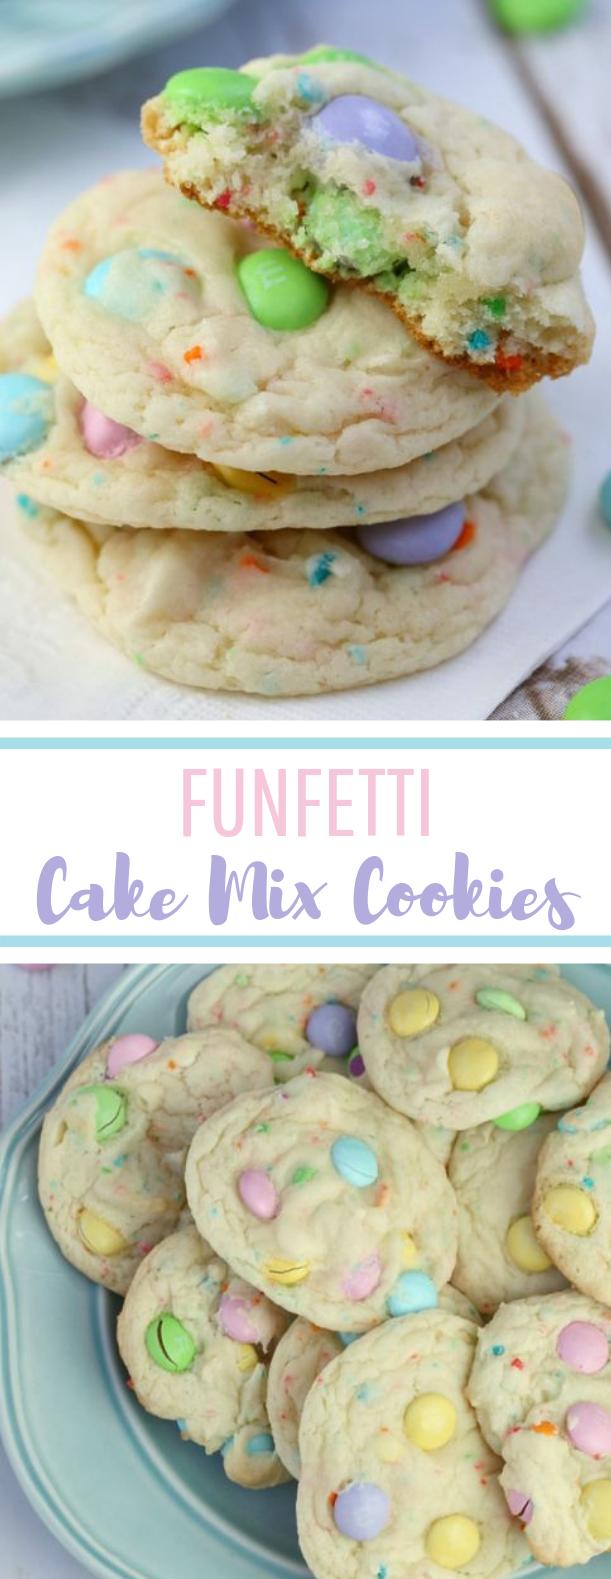 Funfetti Cake Mix Cookies #dessert #easter